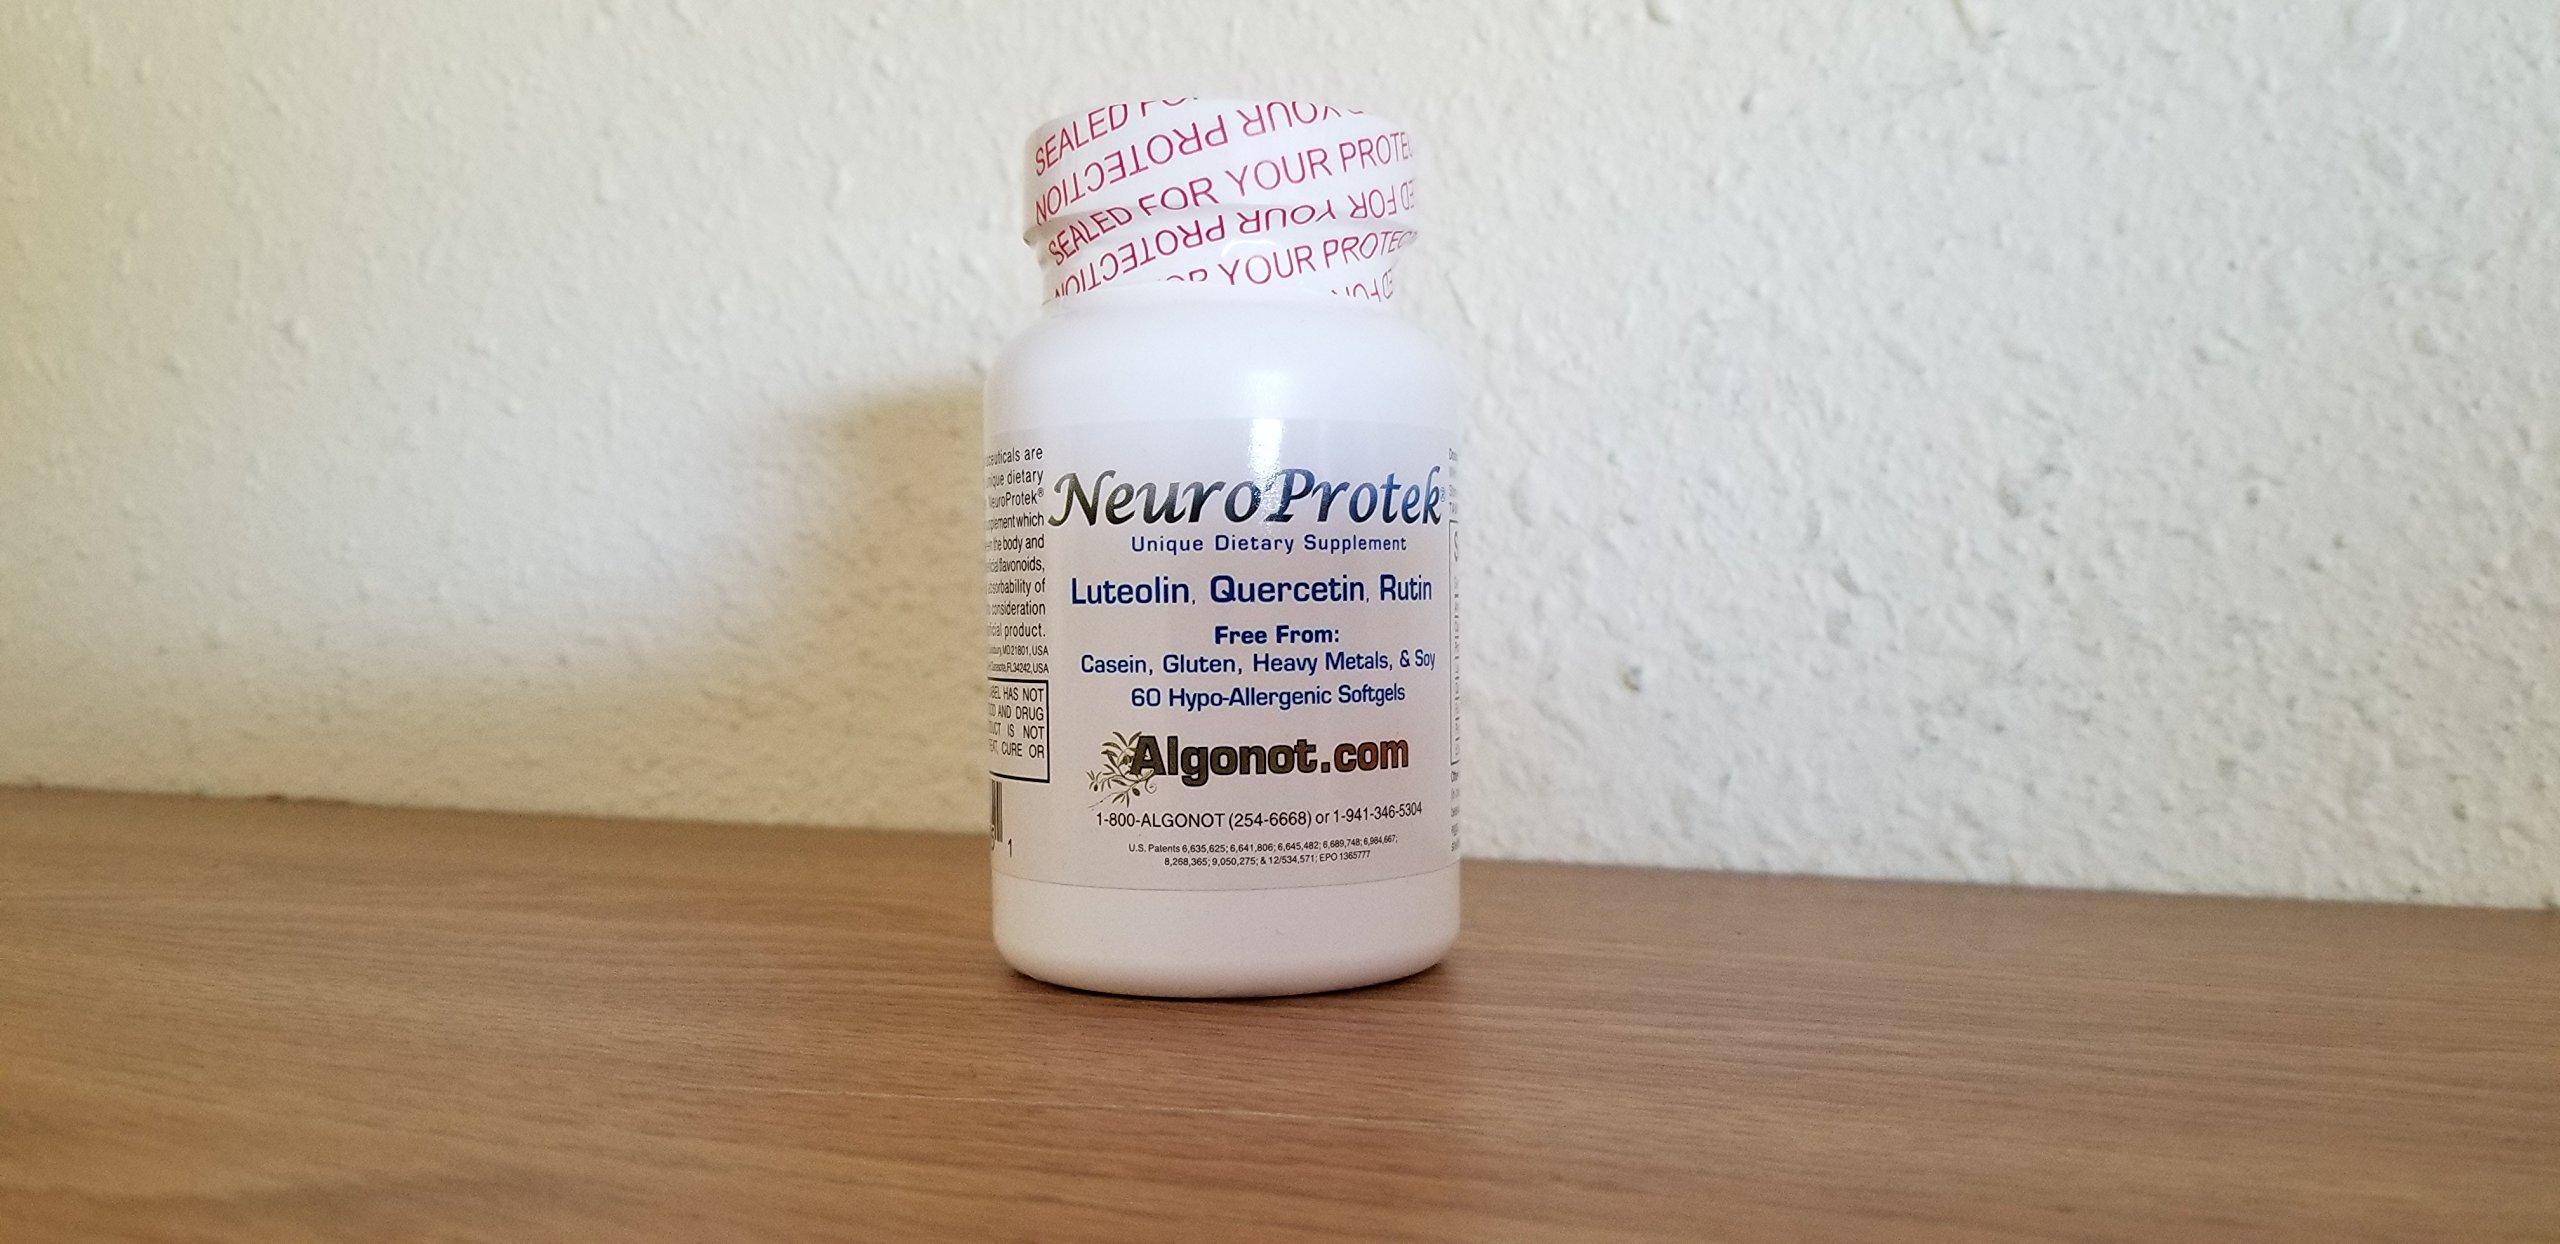 NeuroProtek 4 bottle 10% discount pack (60 softgel per bottle)